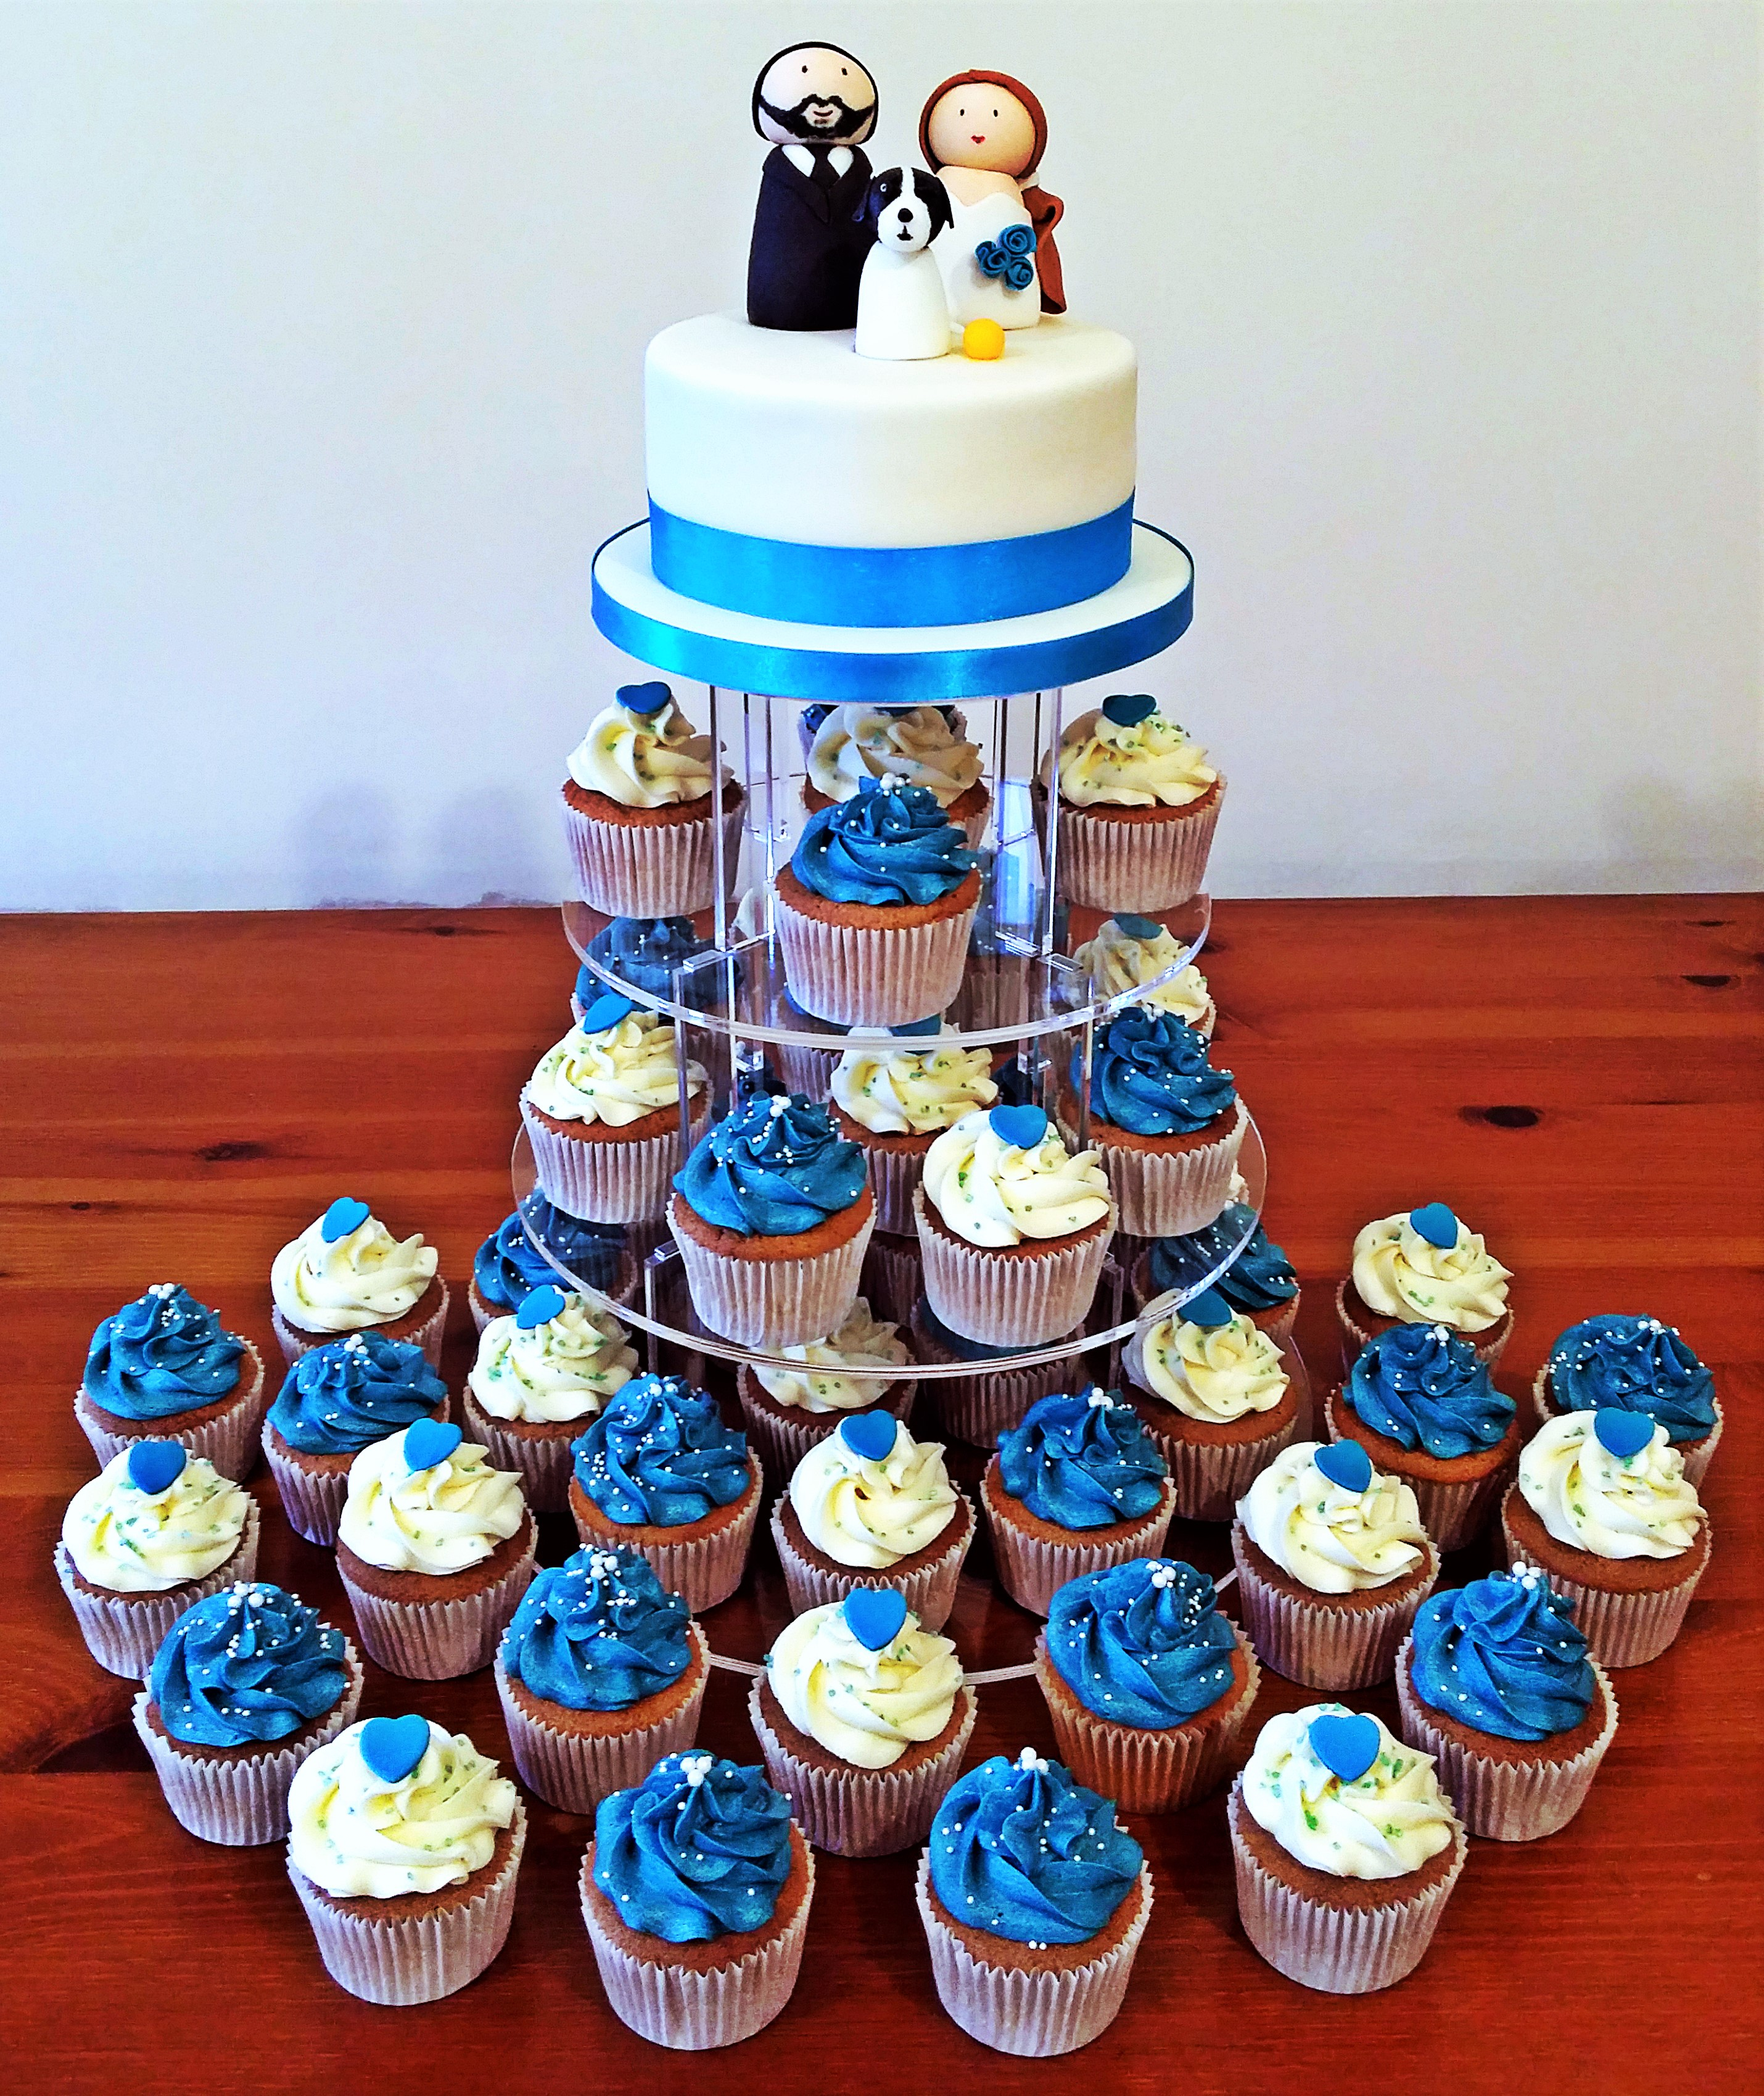 Turquoise Wedding Cake & Cupcakes